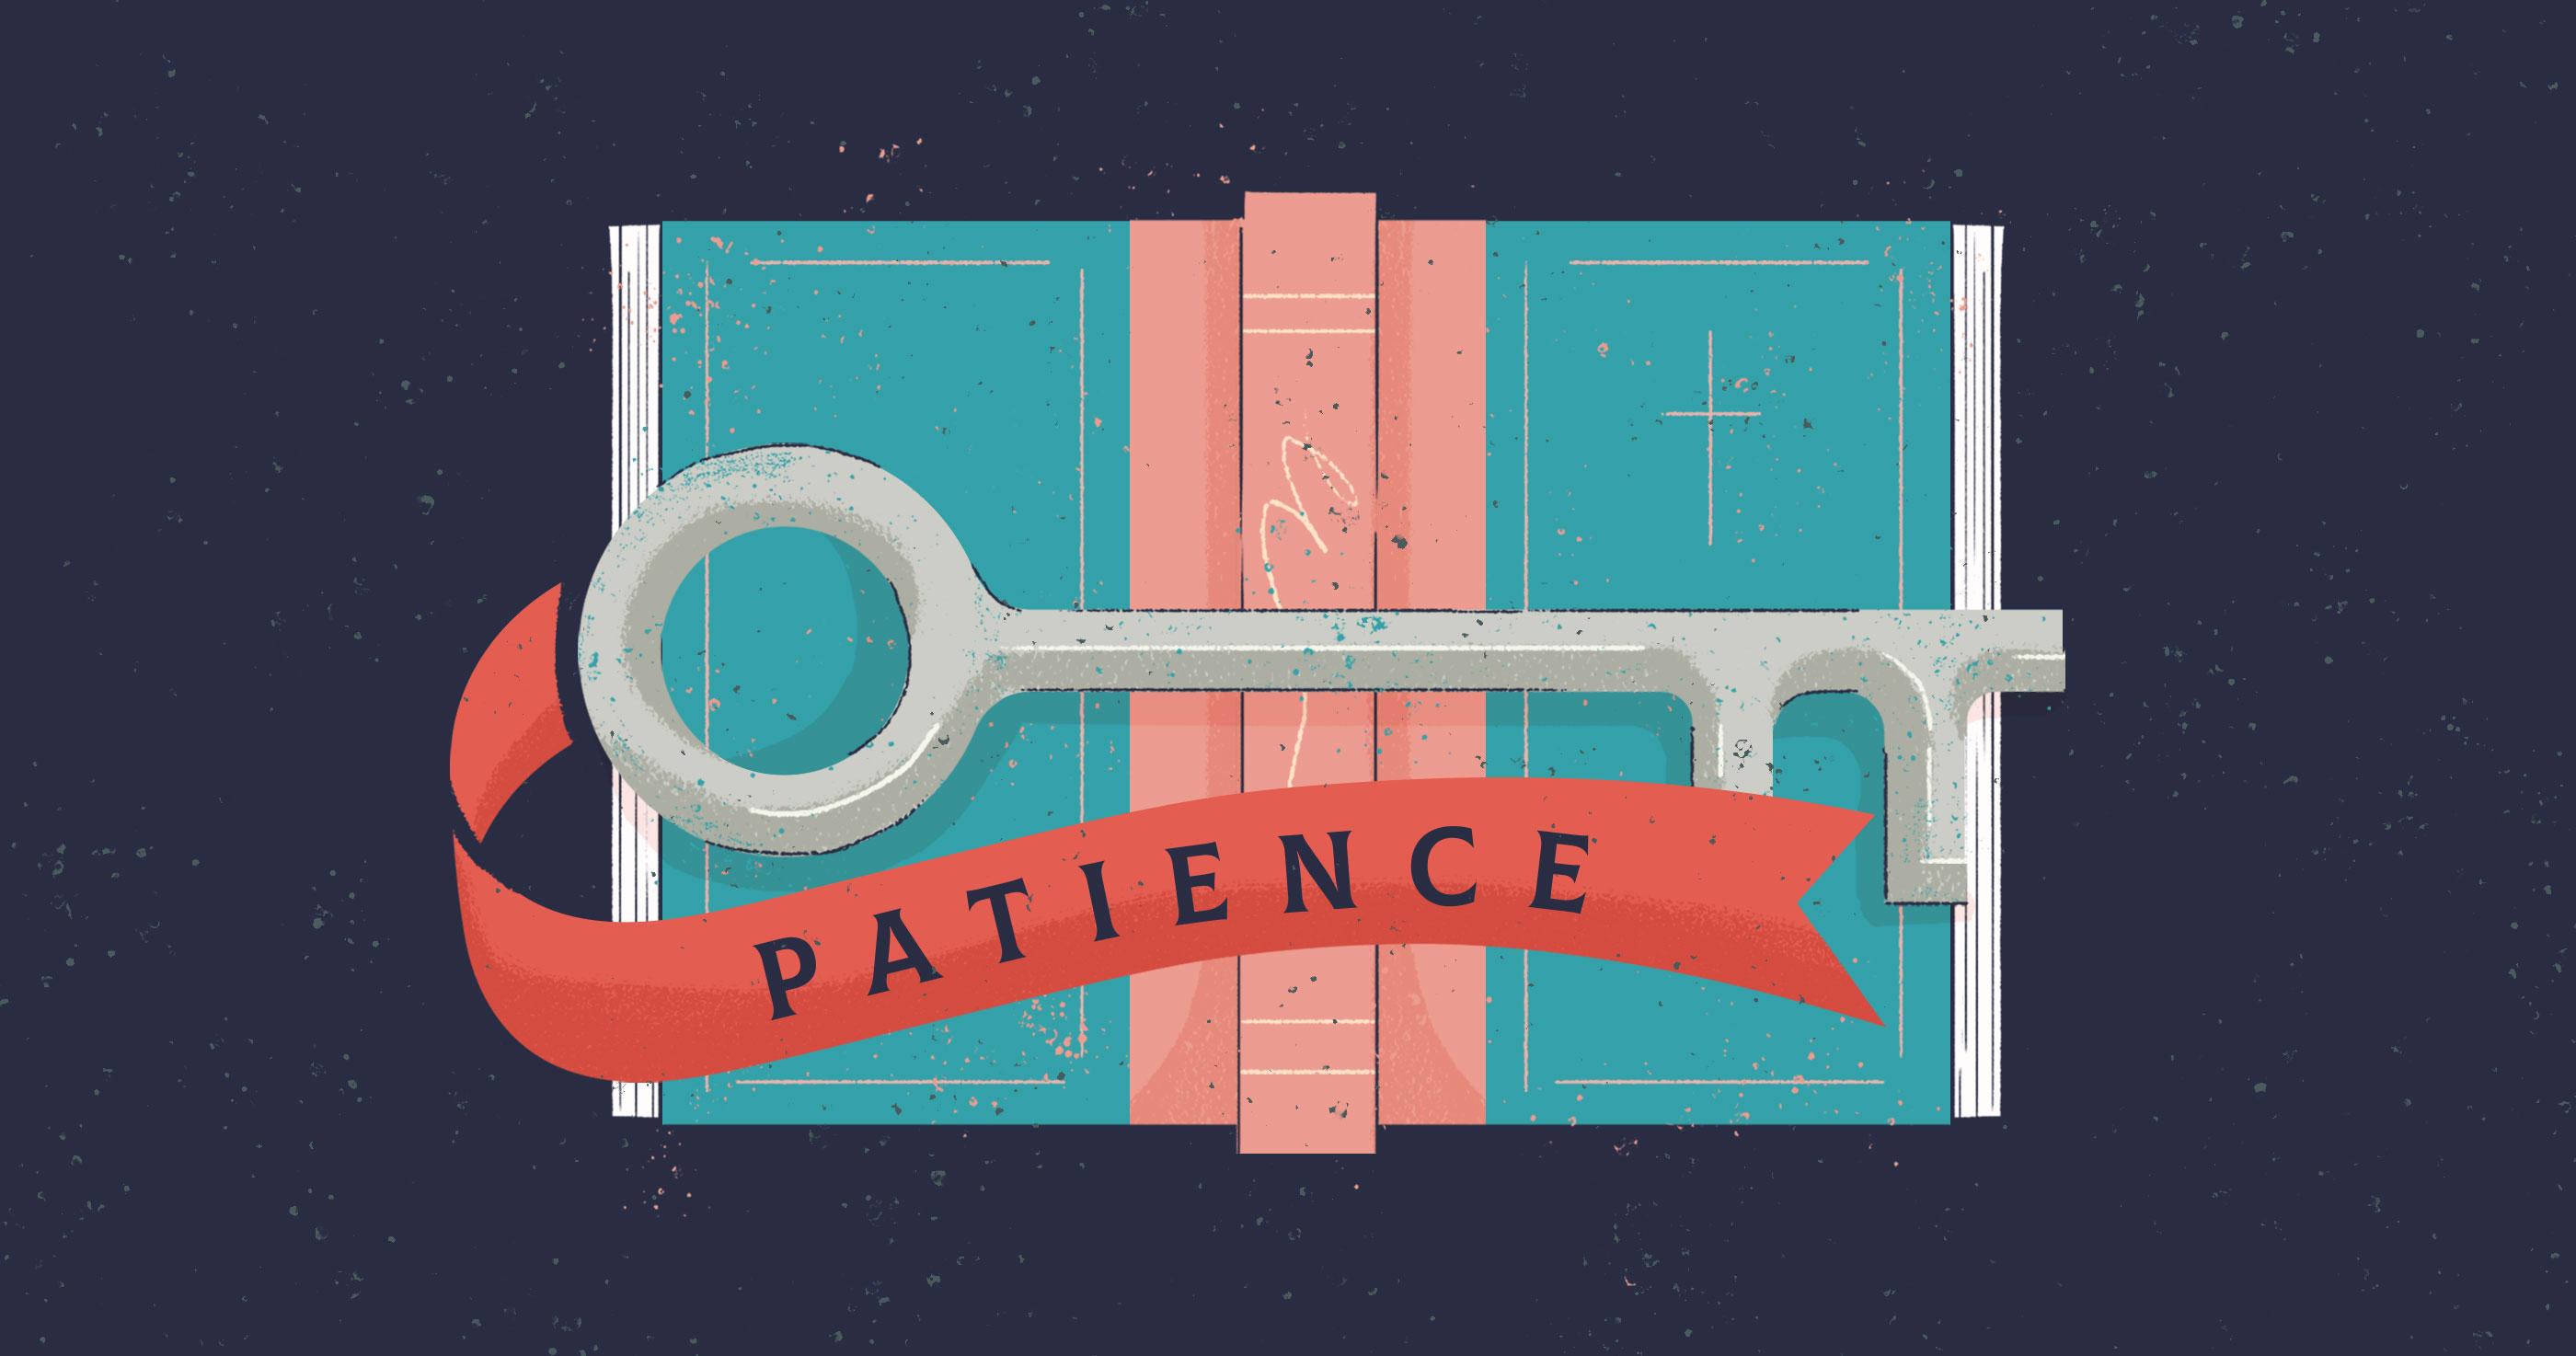 10 Key Bible Verses on Patience